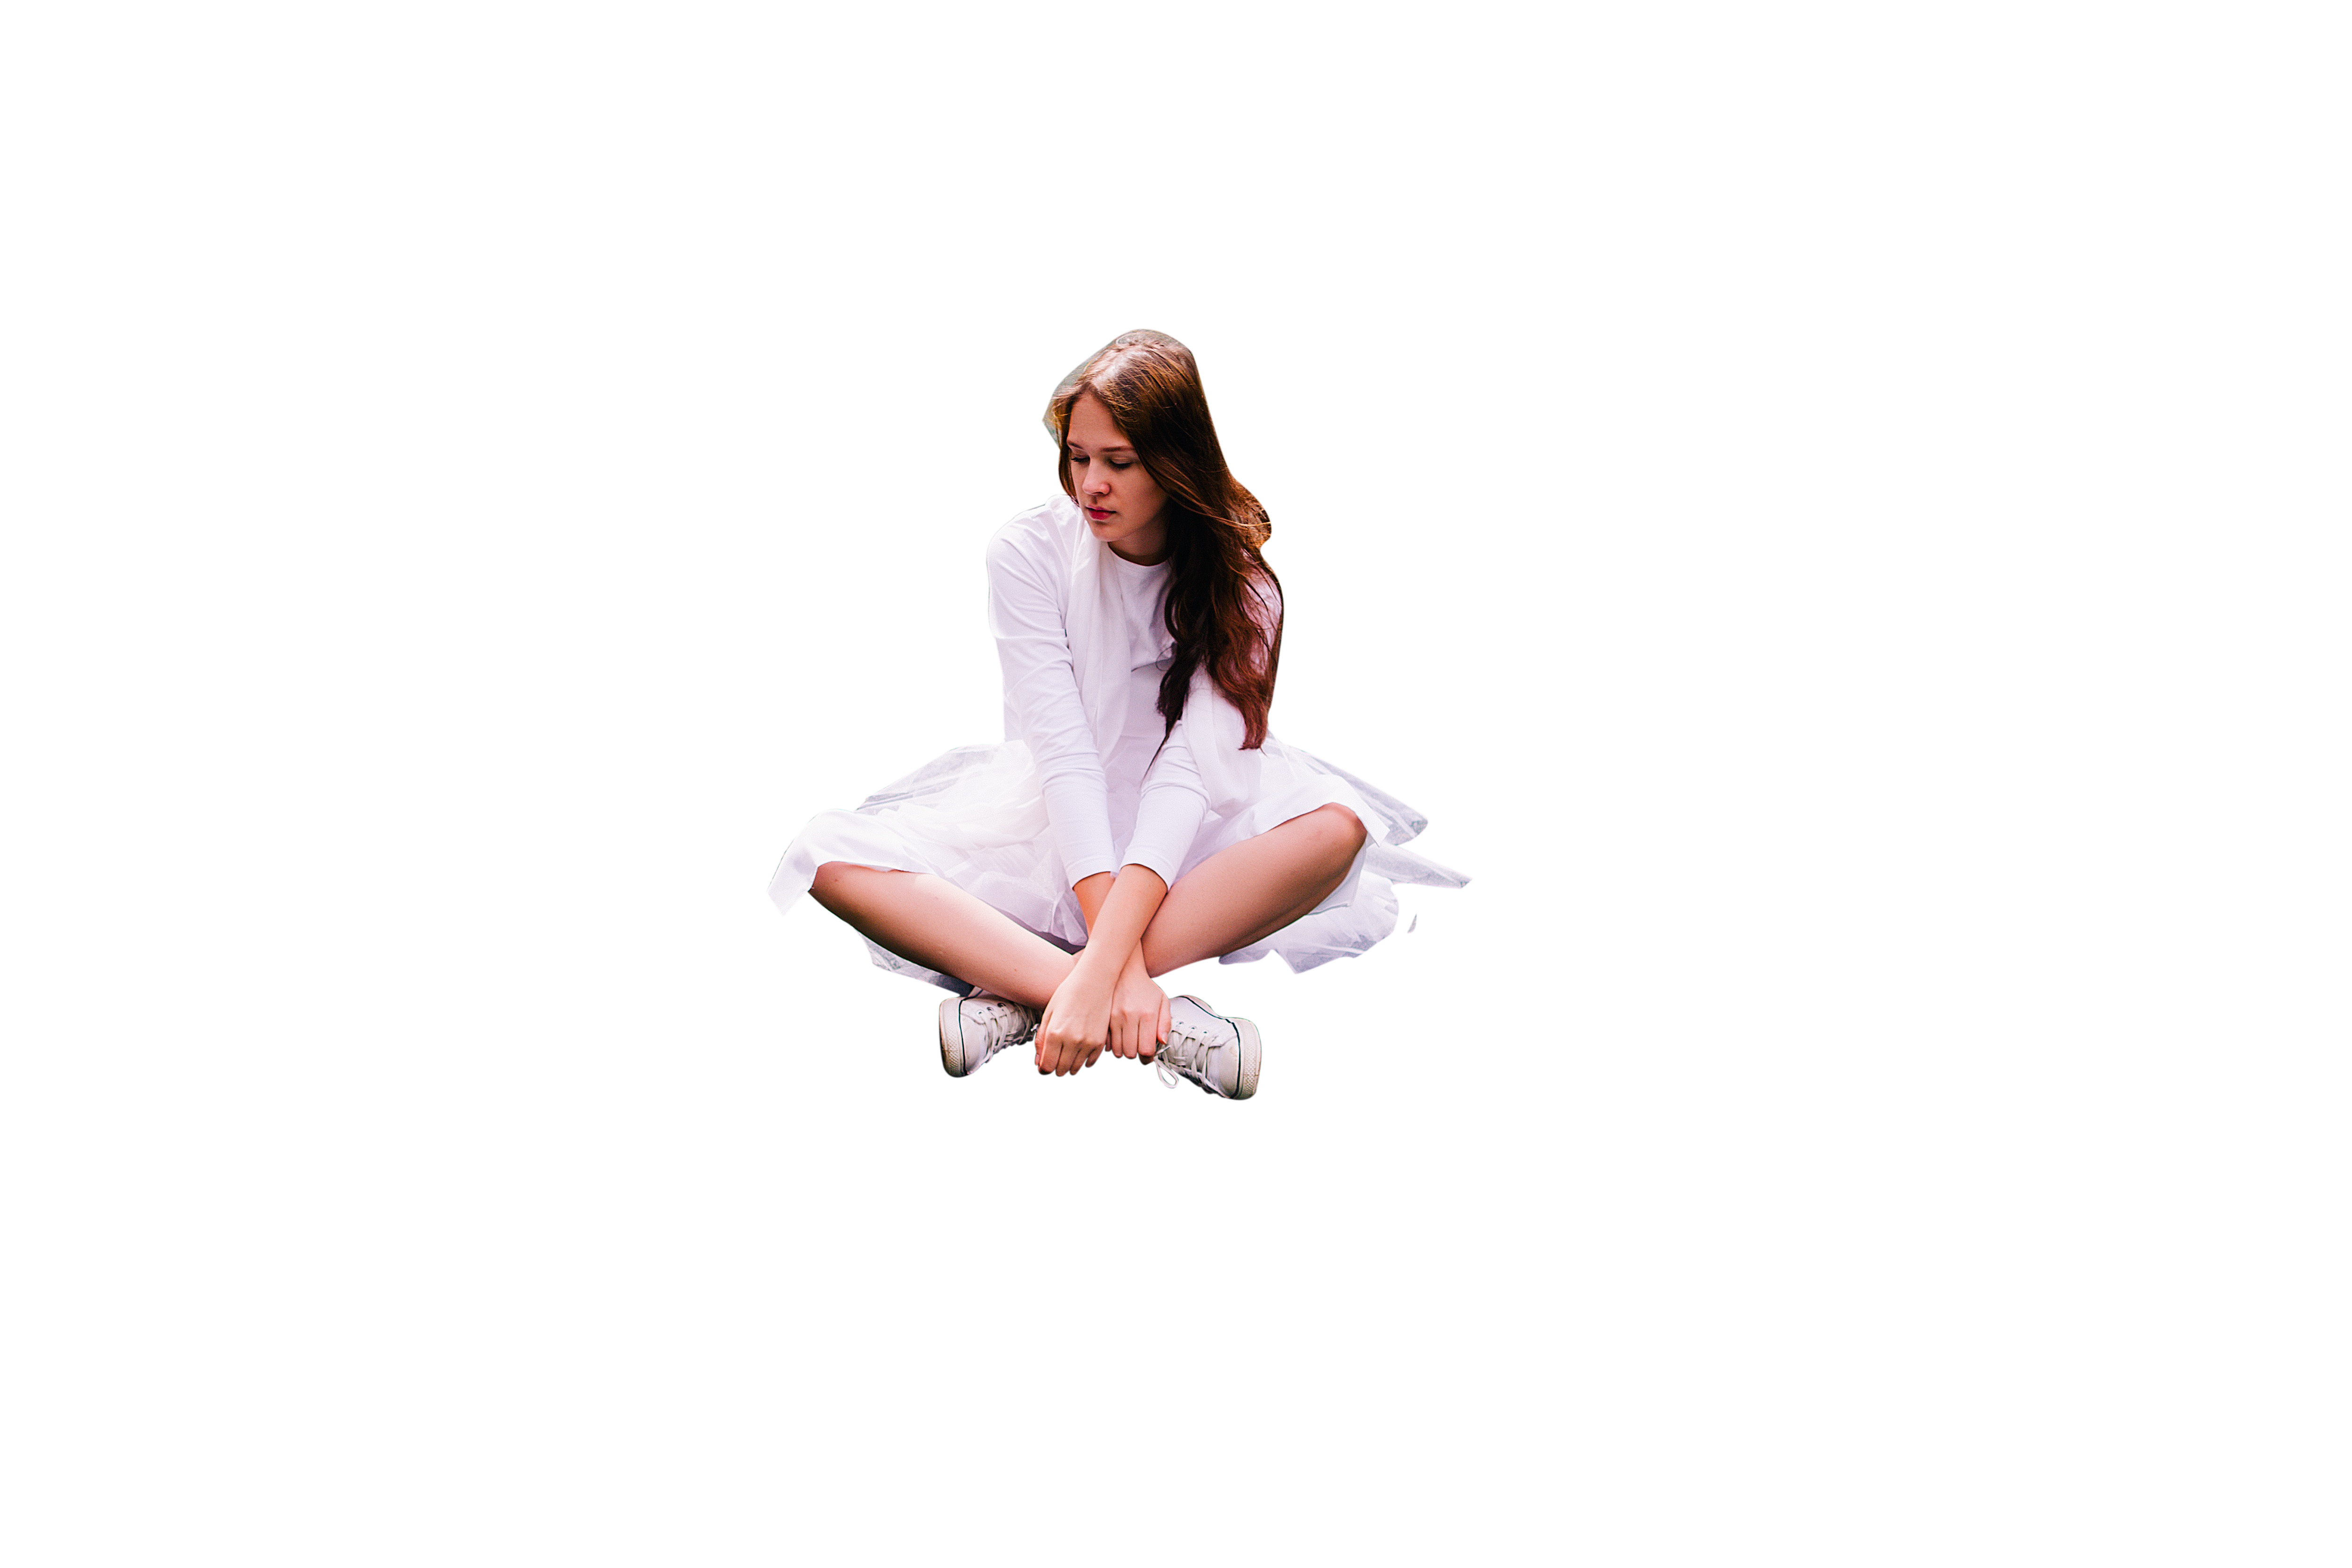 Girl Sitting PNG Image